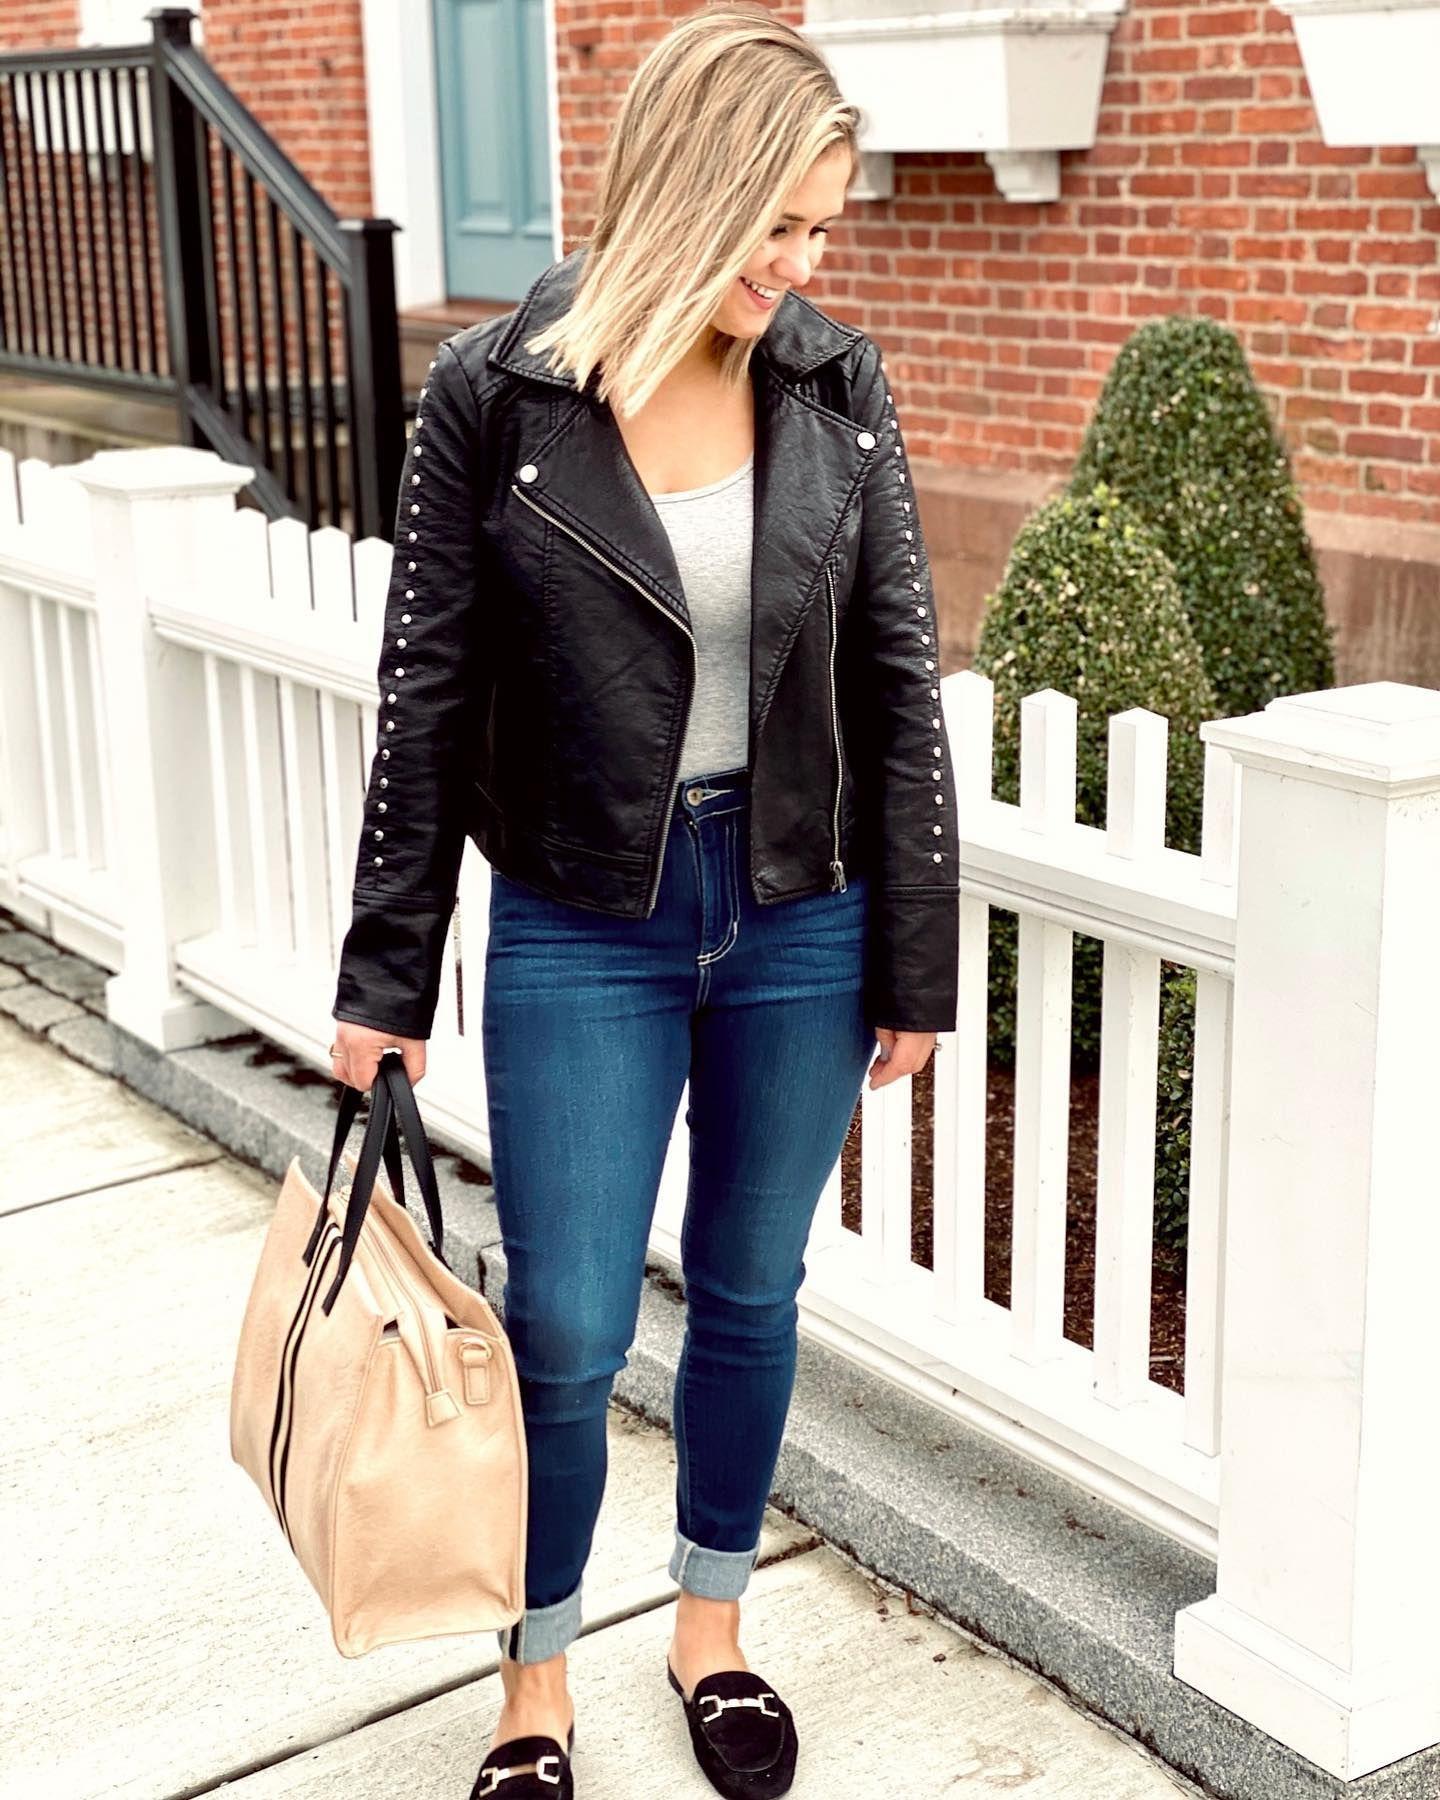 Crushing On This New Leather Jacket Checkout Those Studs Pearlsandplaid Leather Jacket Fashion Style [ 1800 x 1440 Pixel ]